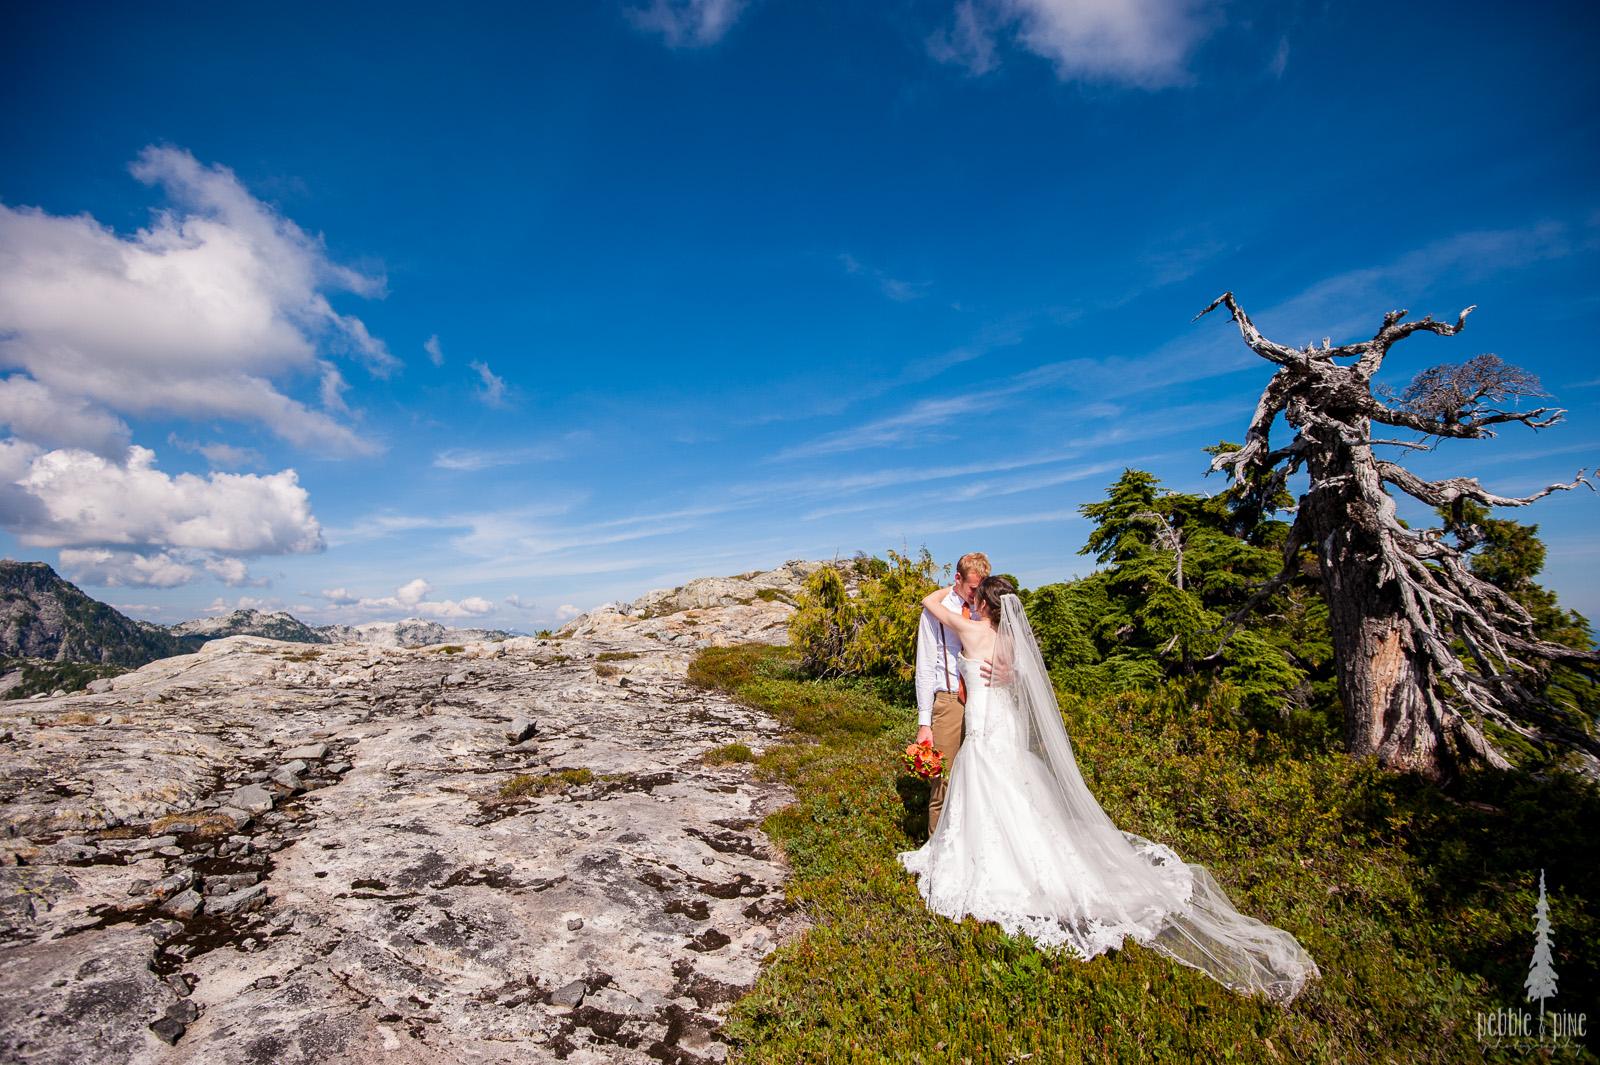 vancouver-island-wedding-photographers-golden-eagle-golf-course-wedding-mountaintop-wedding-41.jpg